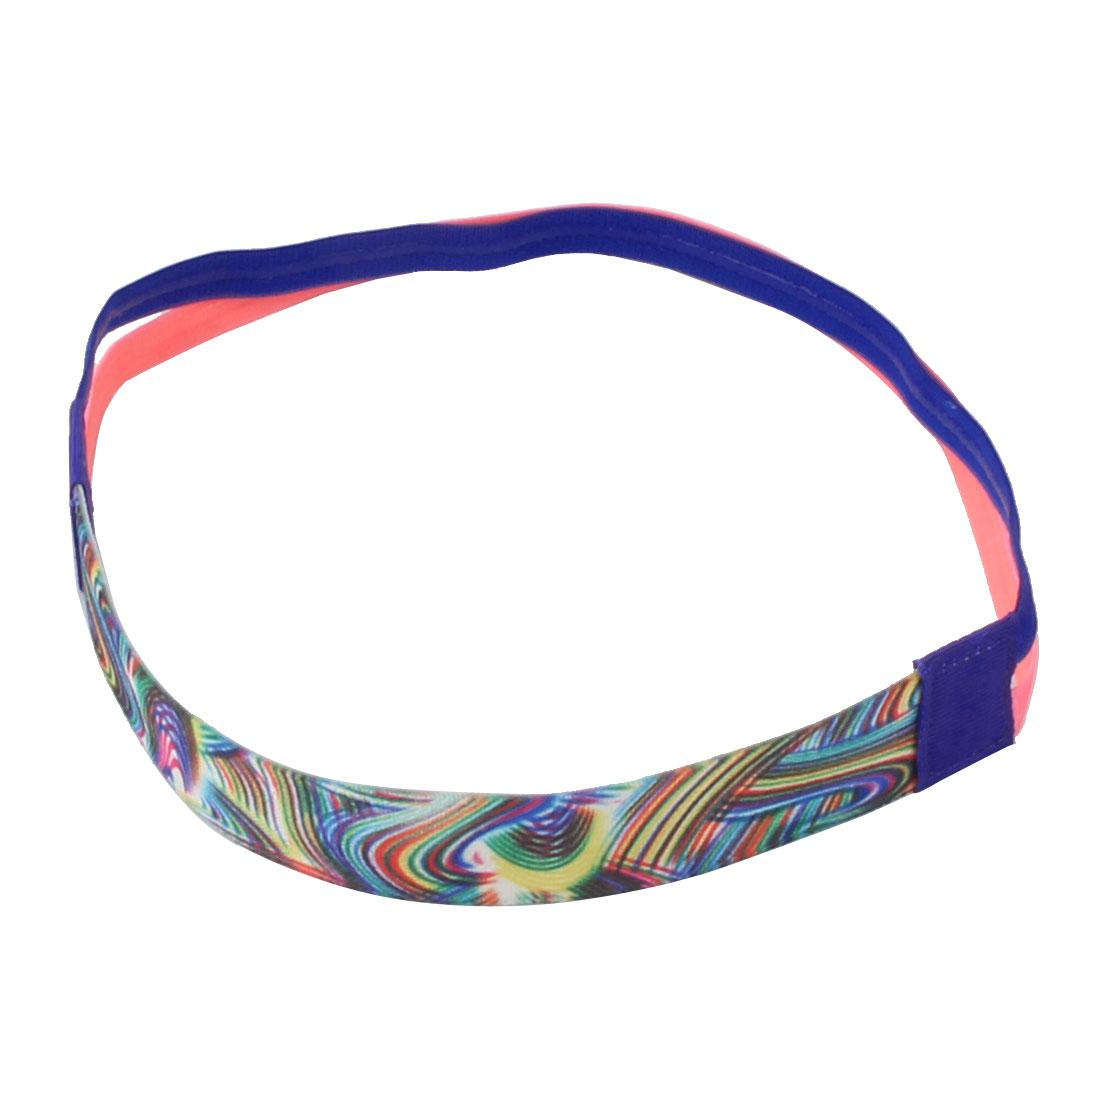 Exercise Silicone Double Line Design Non-slip Sports Headband Headwrap Blue Pink